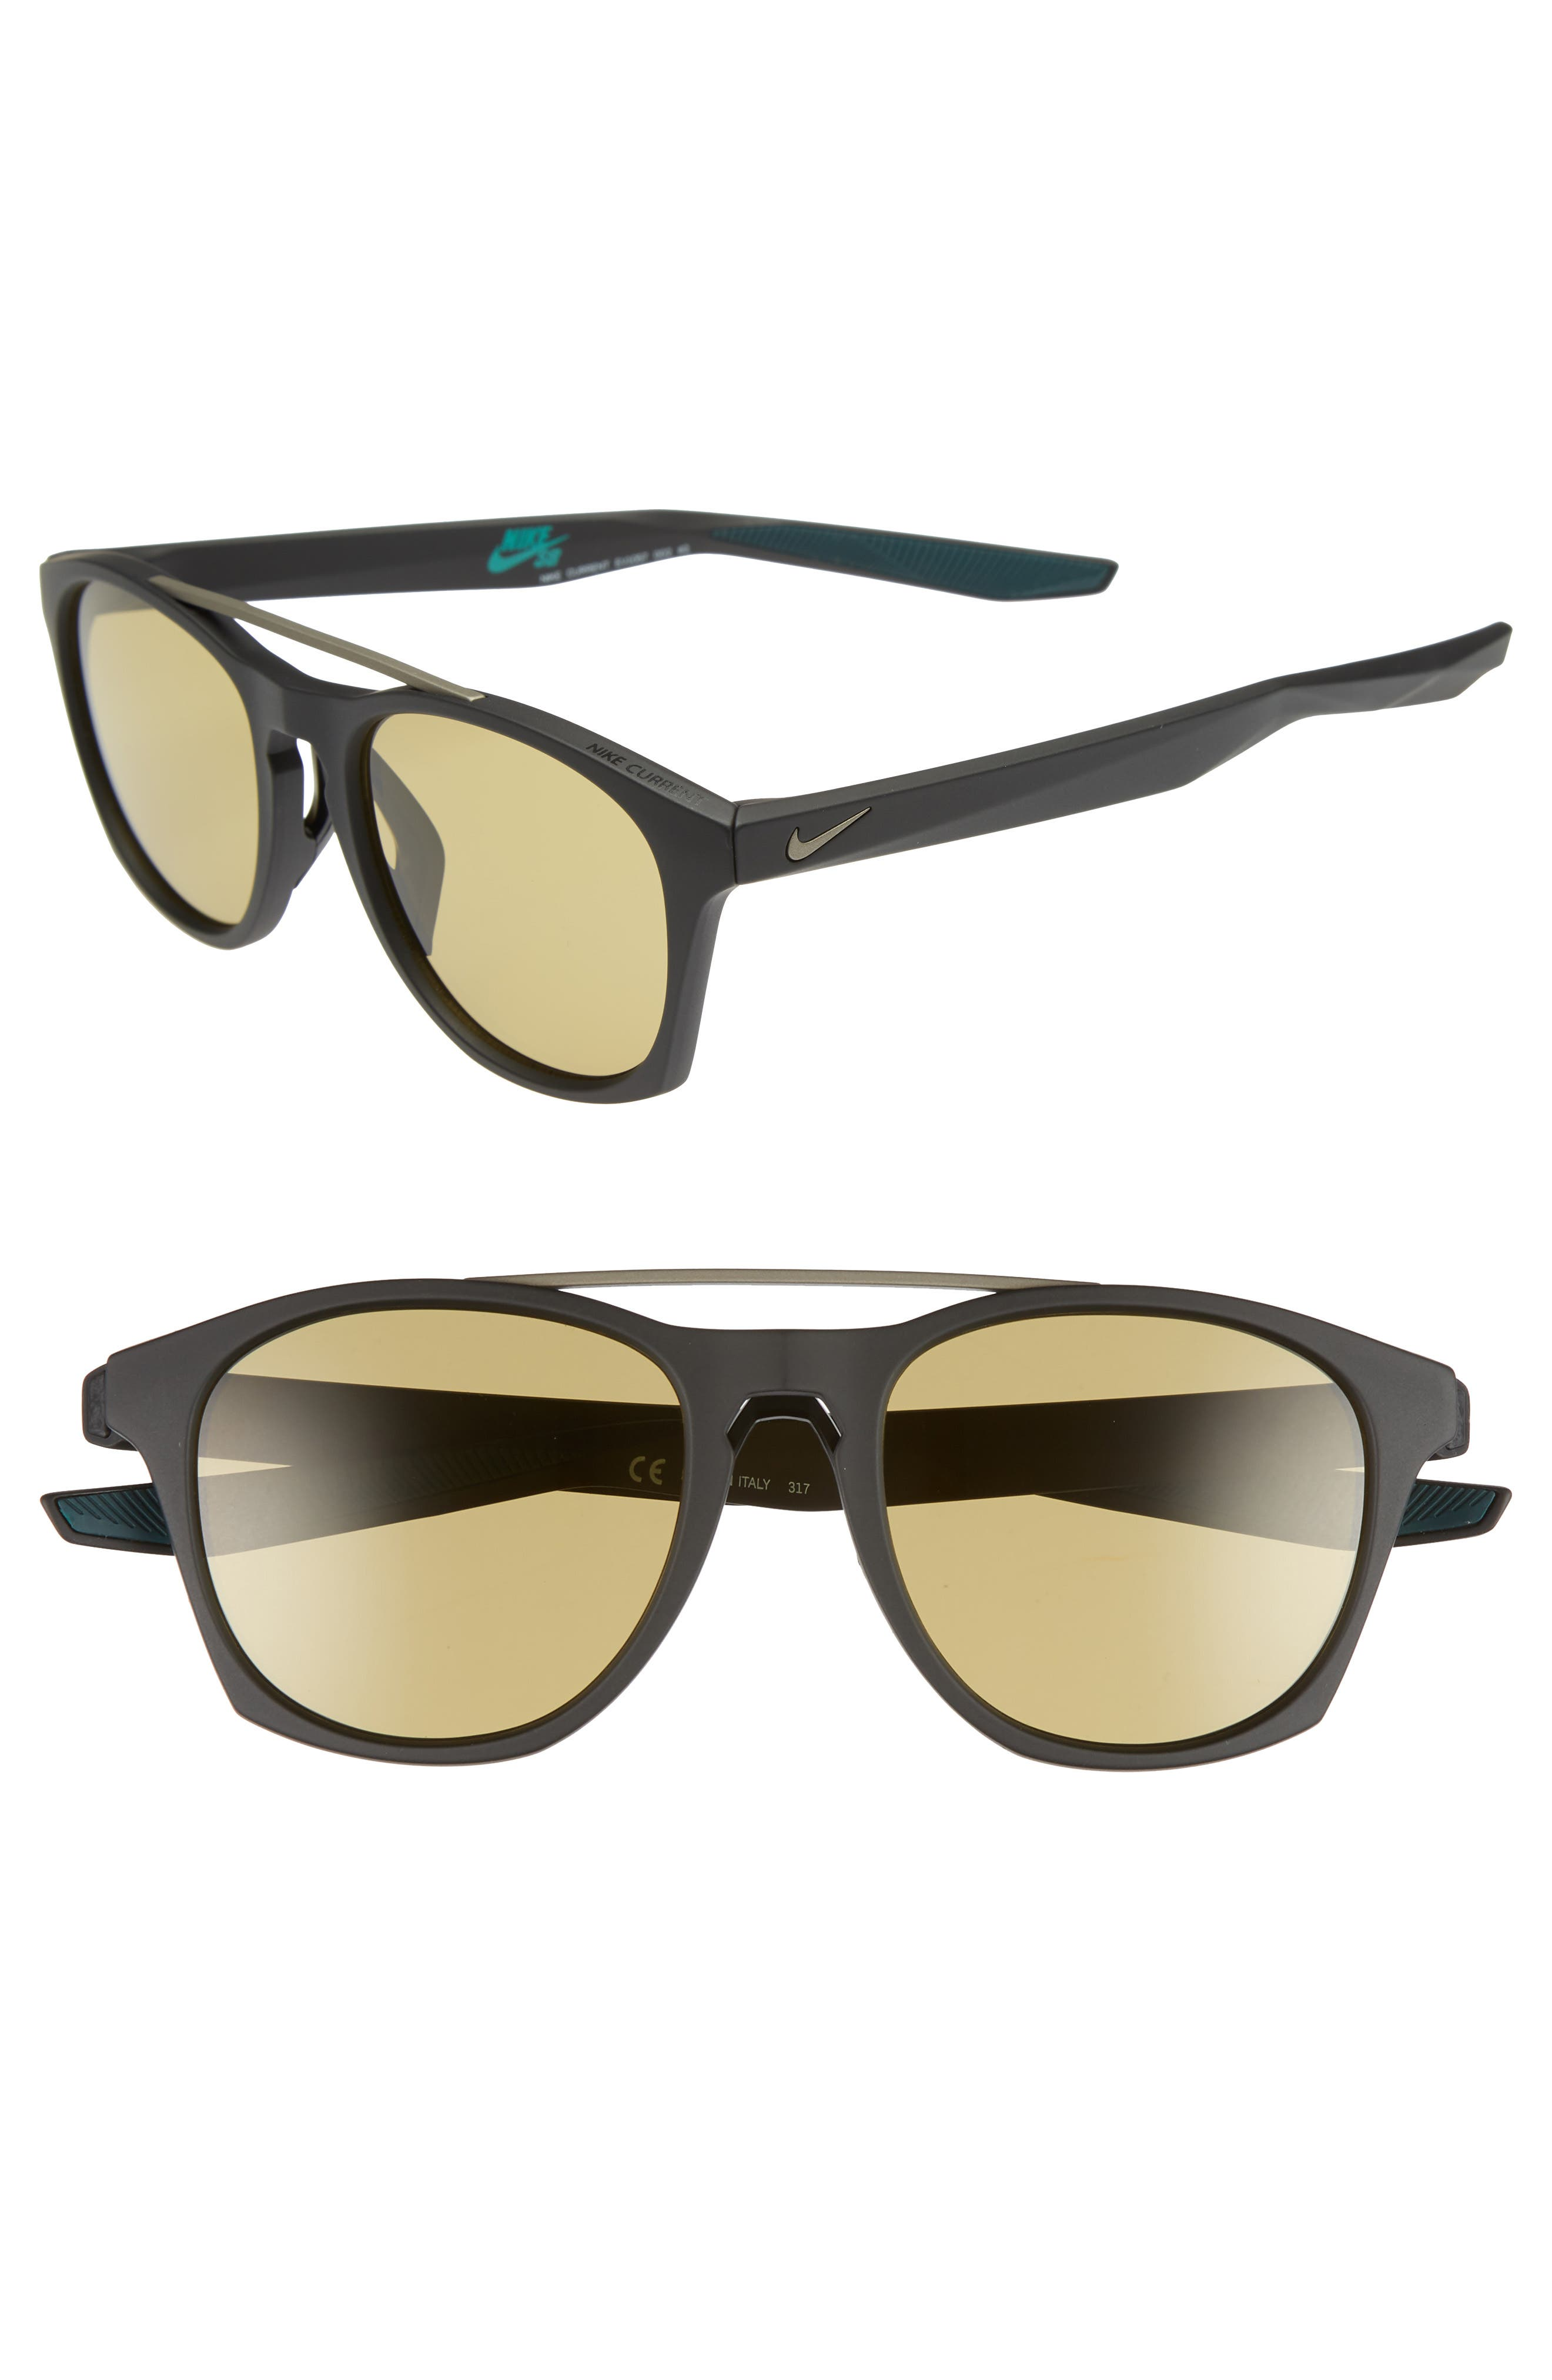 Current 51mm Sunglasses,                             Main thumbnail 1, color,                             MATTE BLACK/ PEWTER/ AMBER